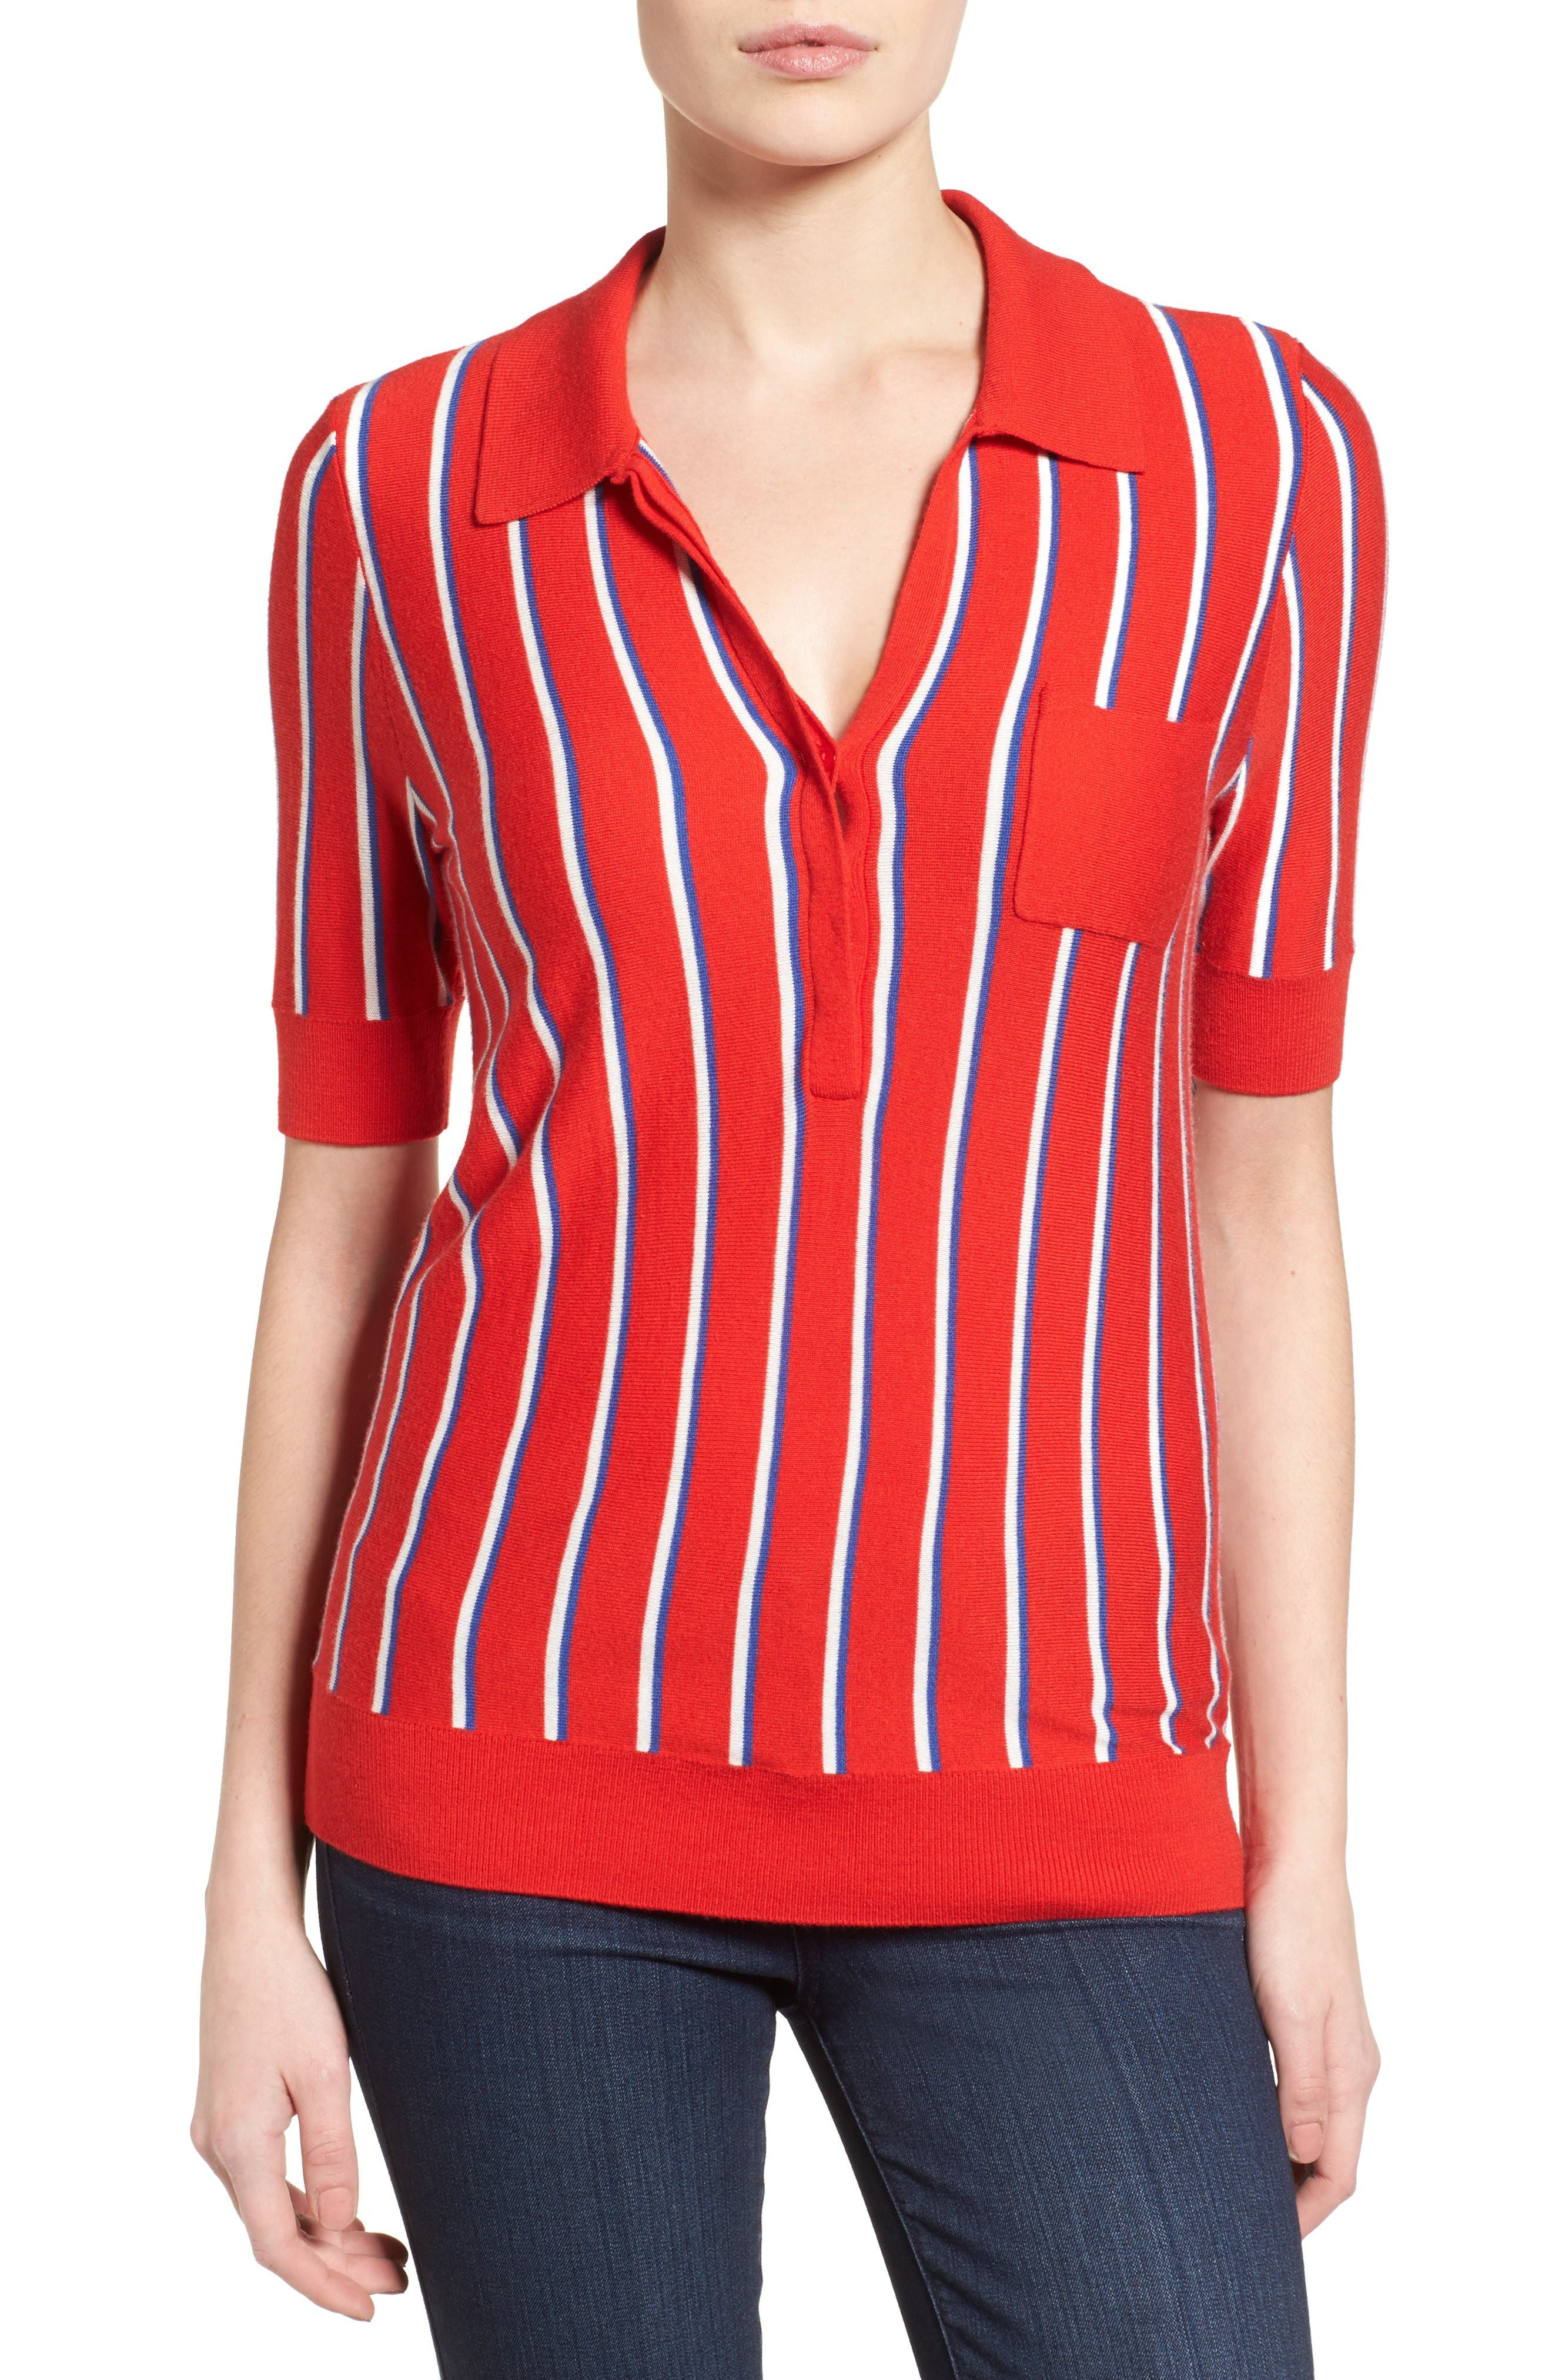 Alternate Image 1 Selected - Halogen® Stripe Polo Sweater (Regular & Petite)